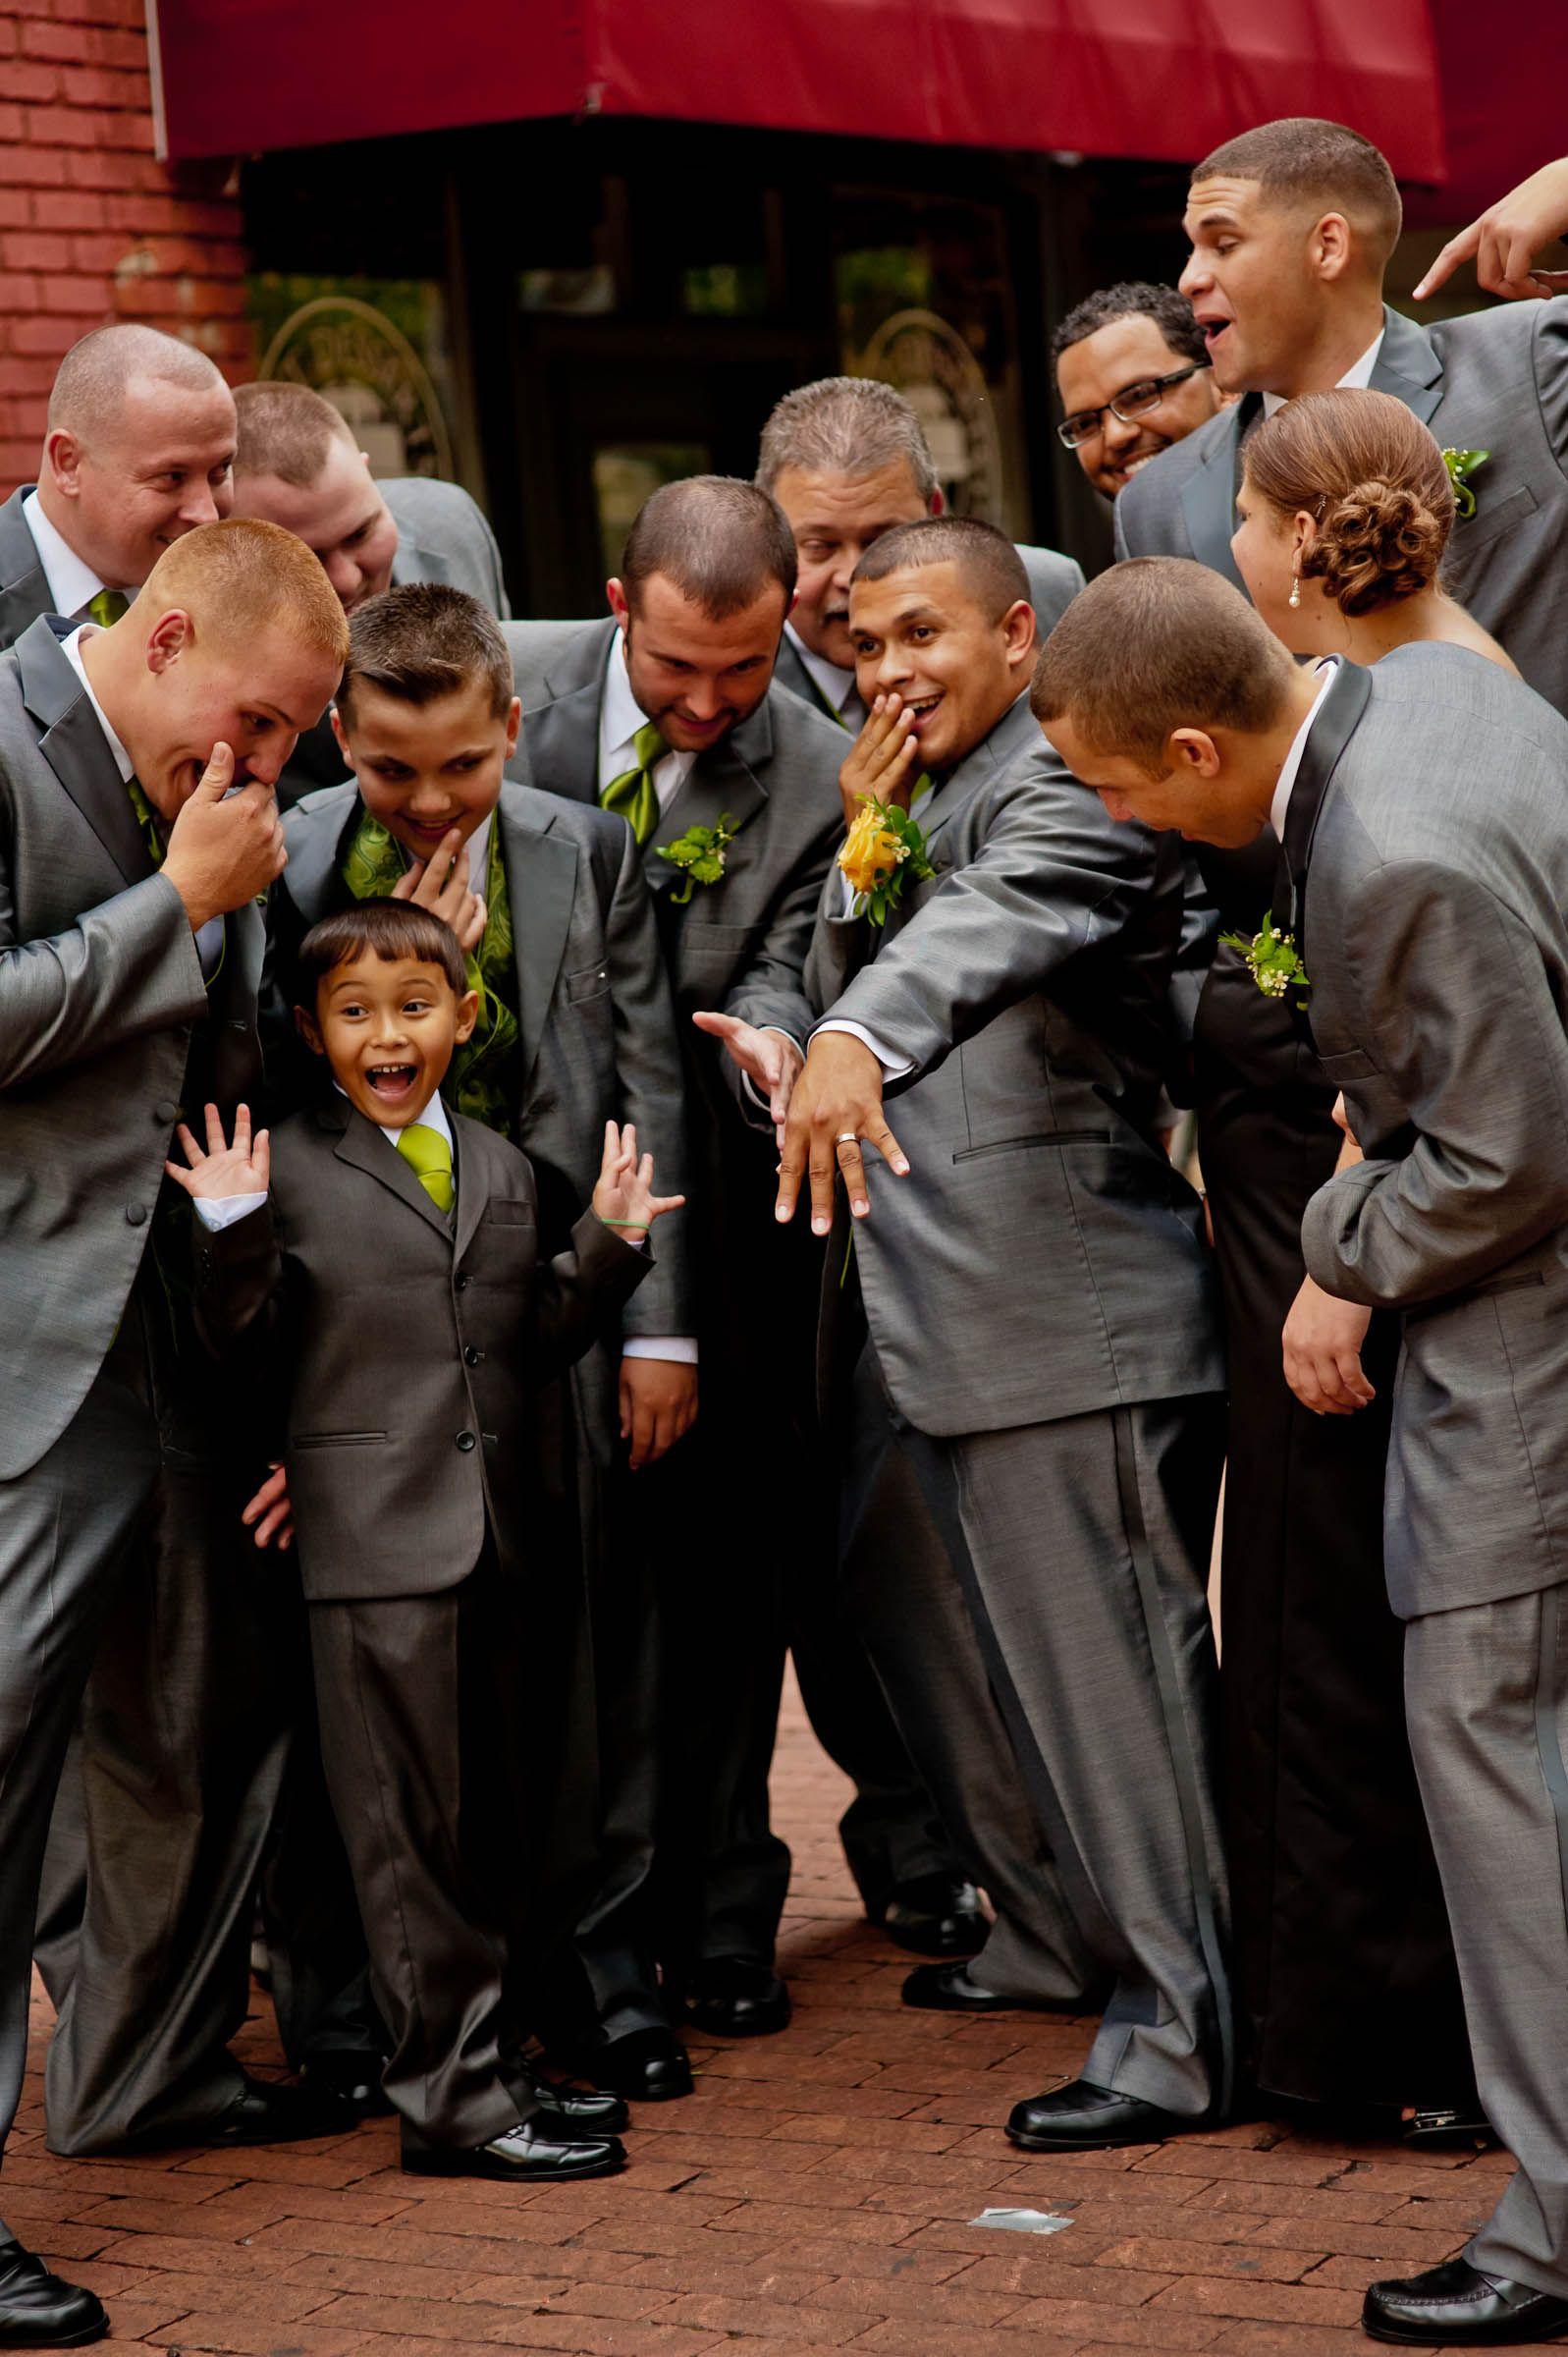 Funny Groomsmen Pose Groomsmen poses, Groomsmen wedding